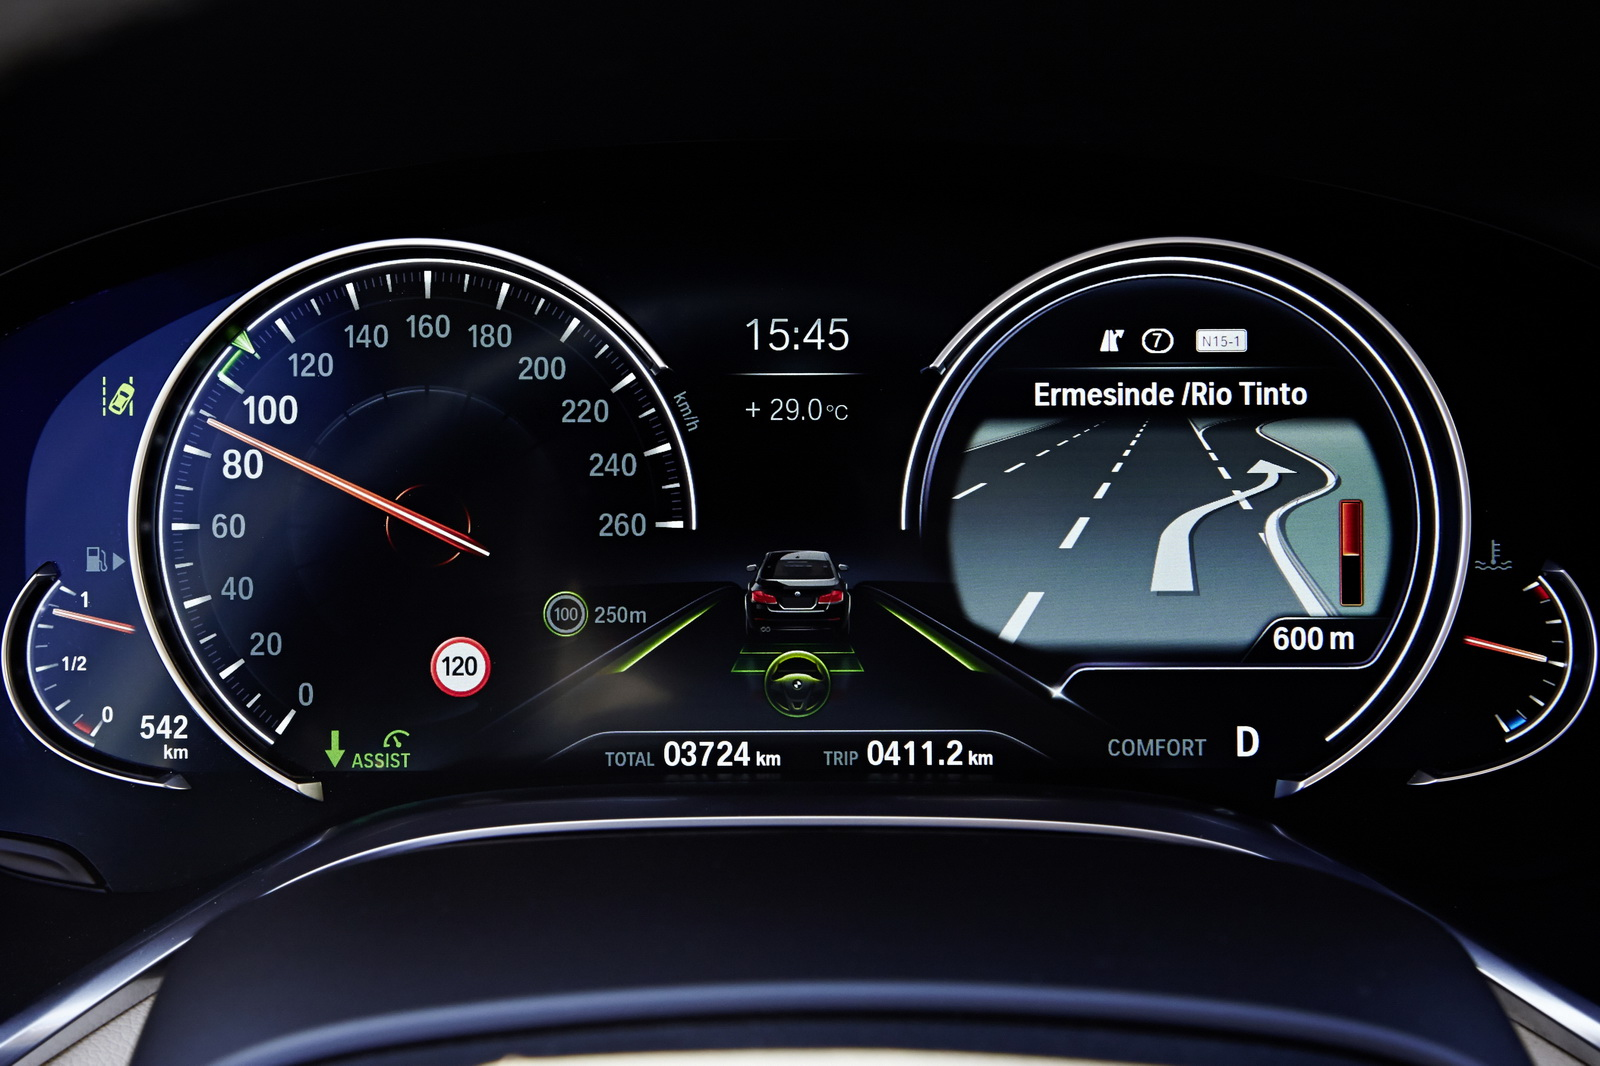 BMW อาจพิจารณาเปลี่ยนหน้าปัดรถยนต์เป็นหน้าจอดิจิทัลทั้งหมด